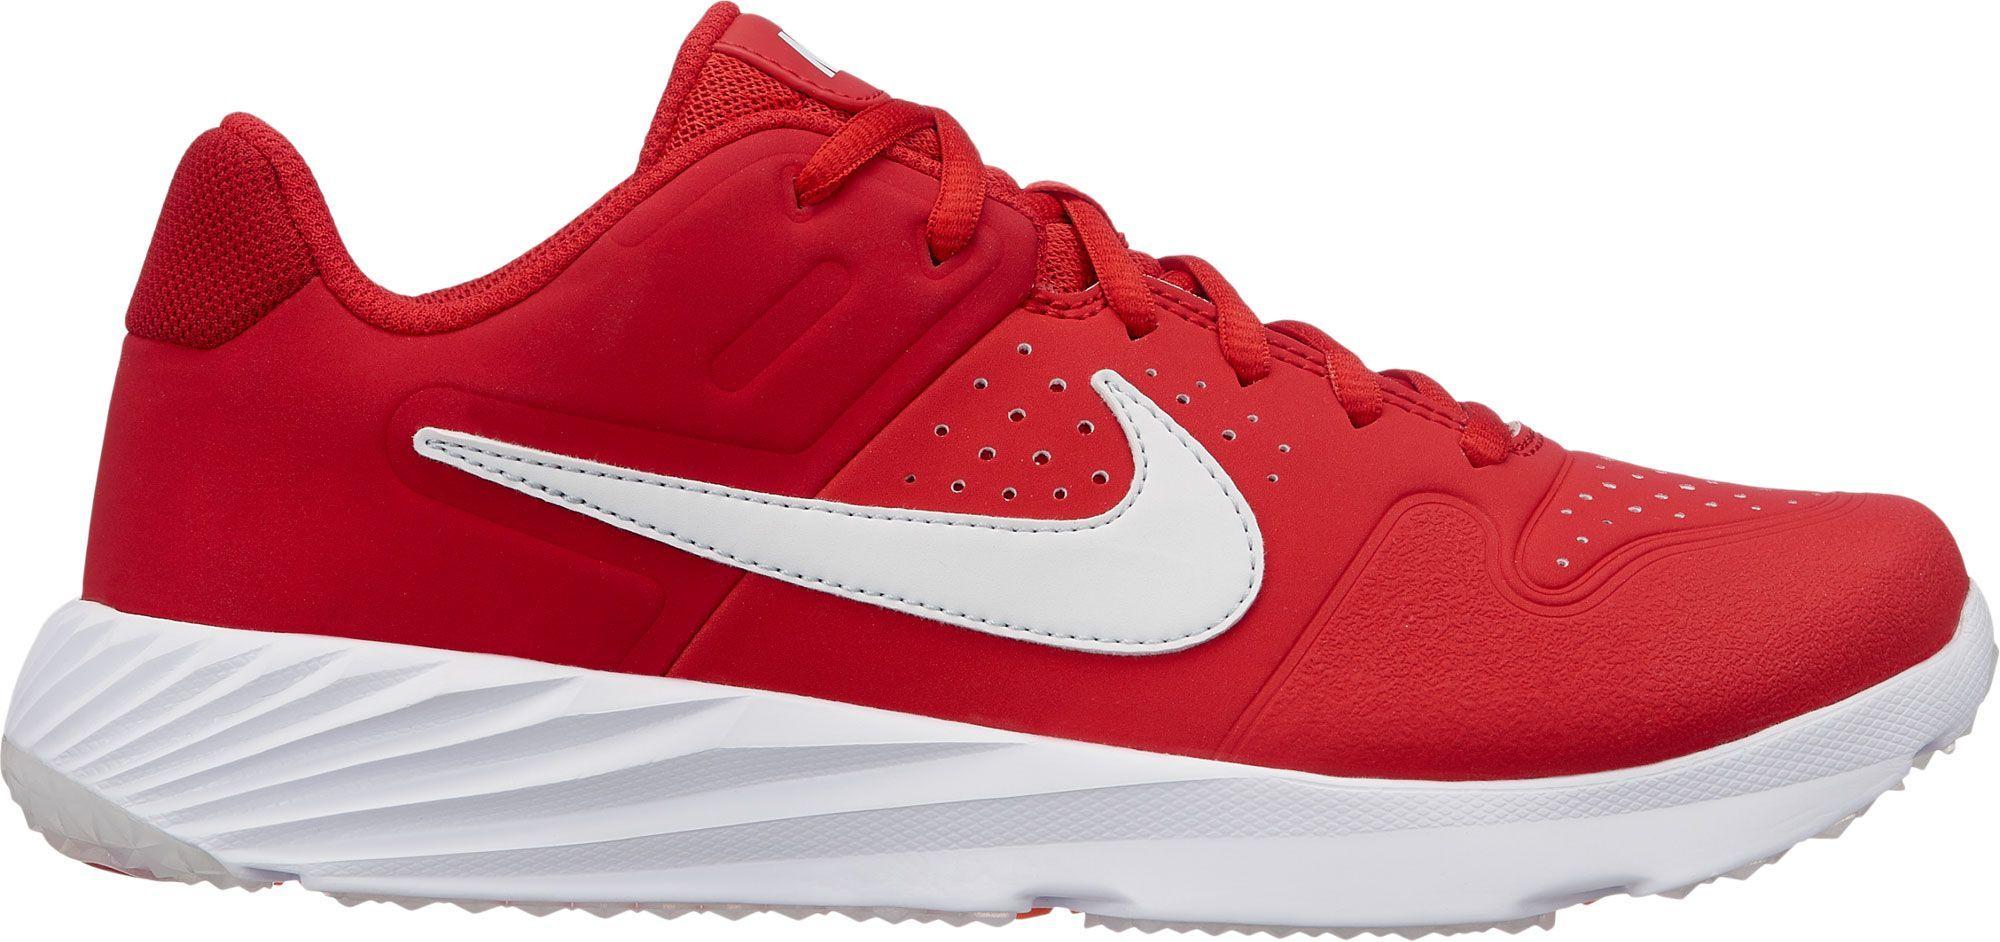 quality design 2094c 540fc Nike Kids  Alpha Huarache Varsity Turf Baseball Cleats, Size  5.0, Red